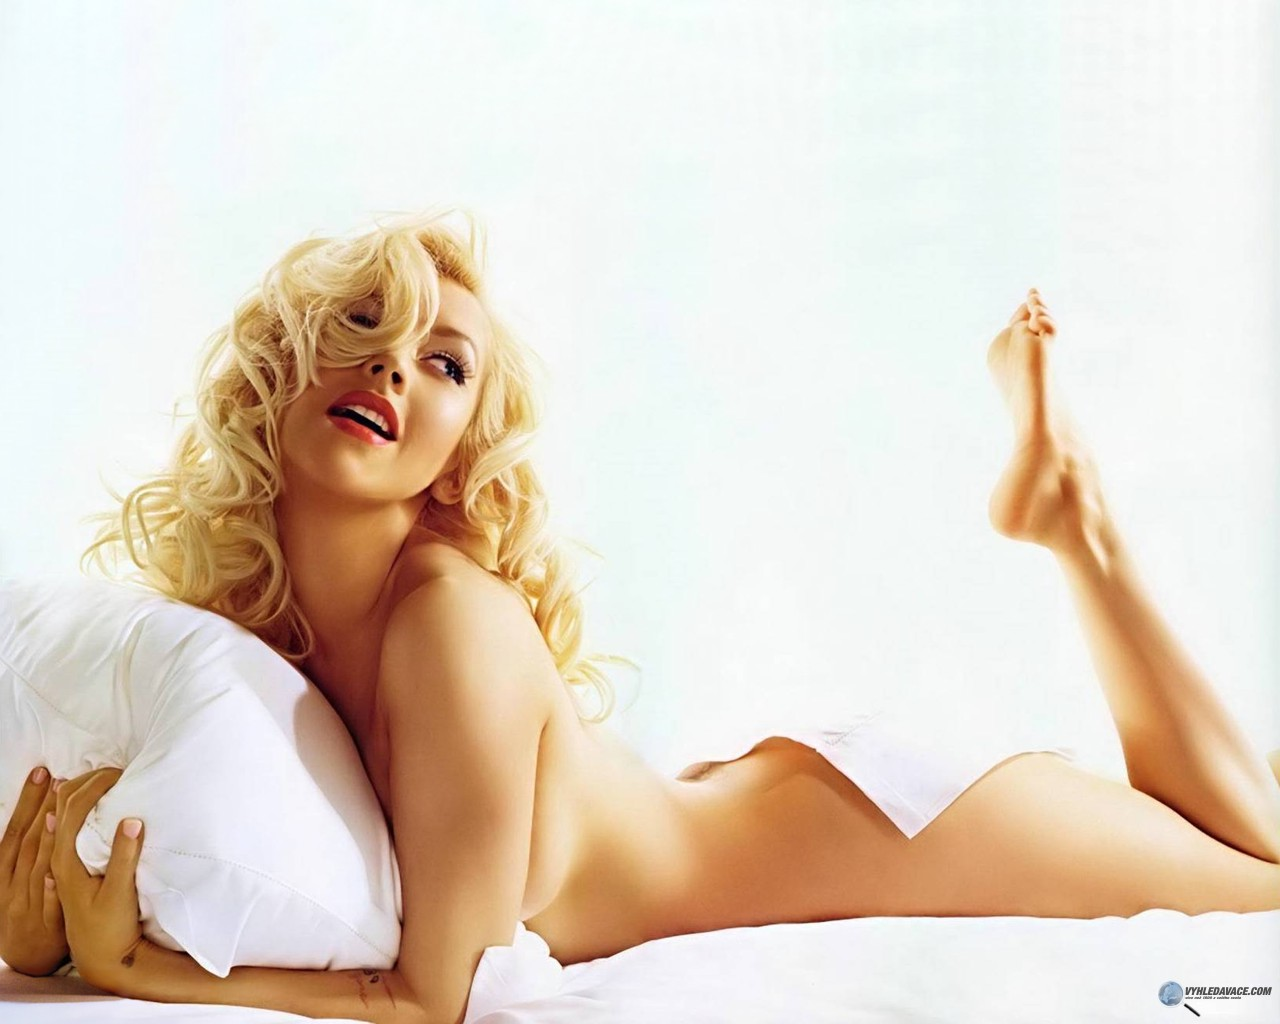 http://1.bp.blogspot.com/_GeSmr0dEG4w/TAMA8fhKNoI/AAAAAAAACEQ/aZD6I6-0eOw/s1600/Christina_Aguilera.jpg